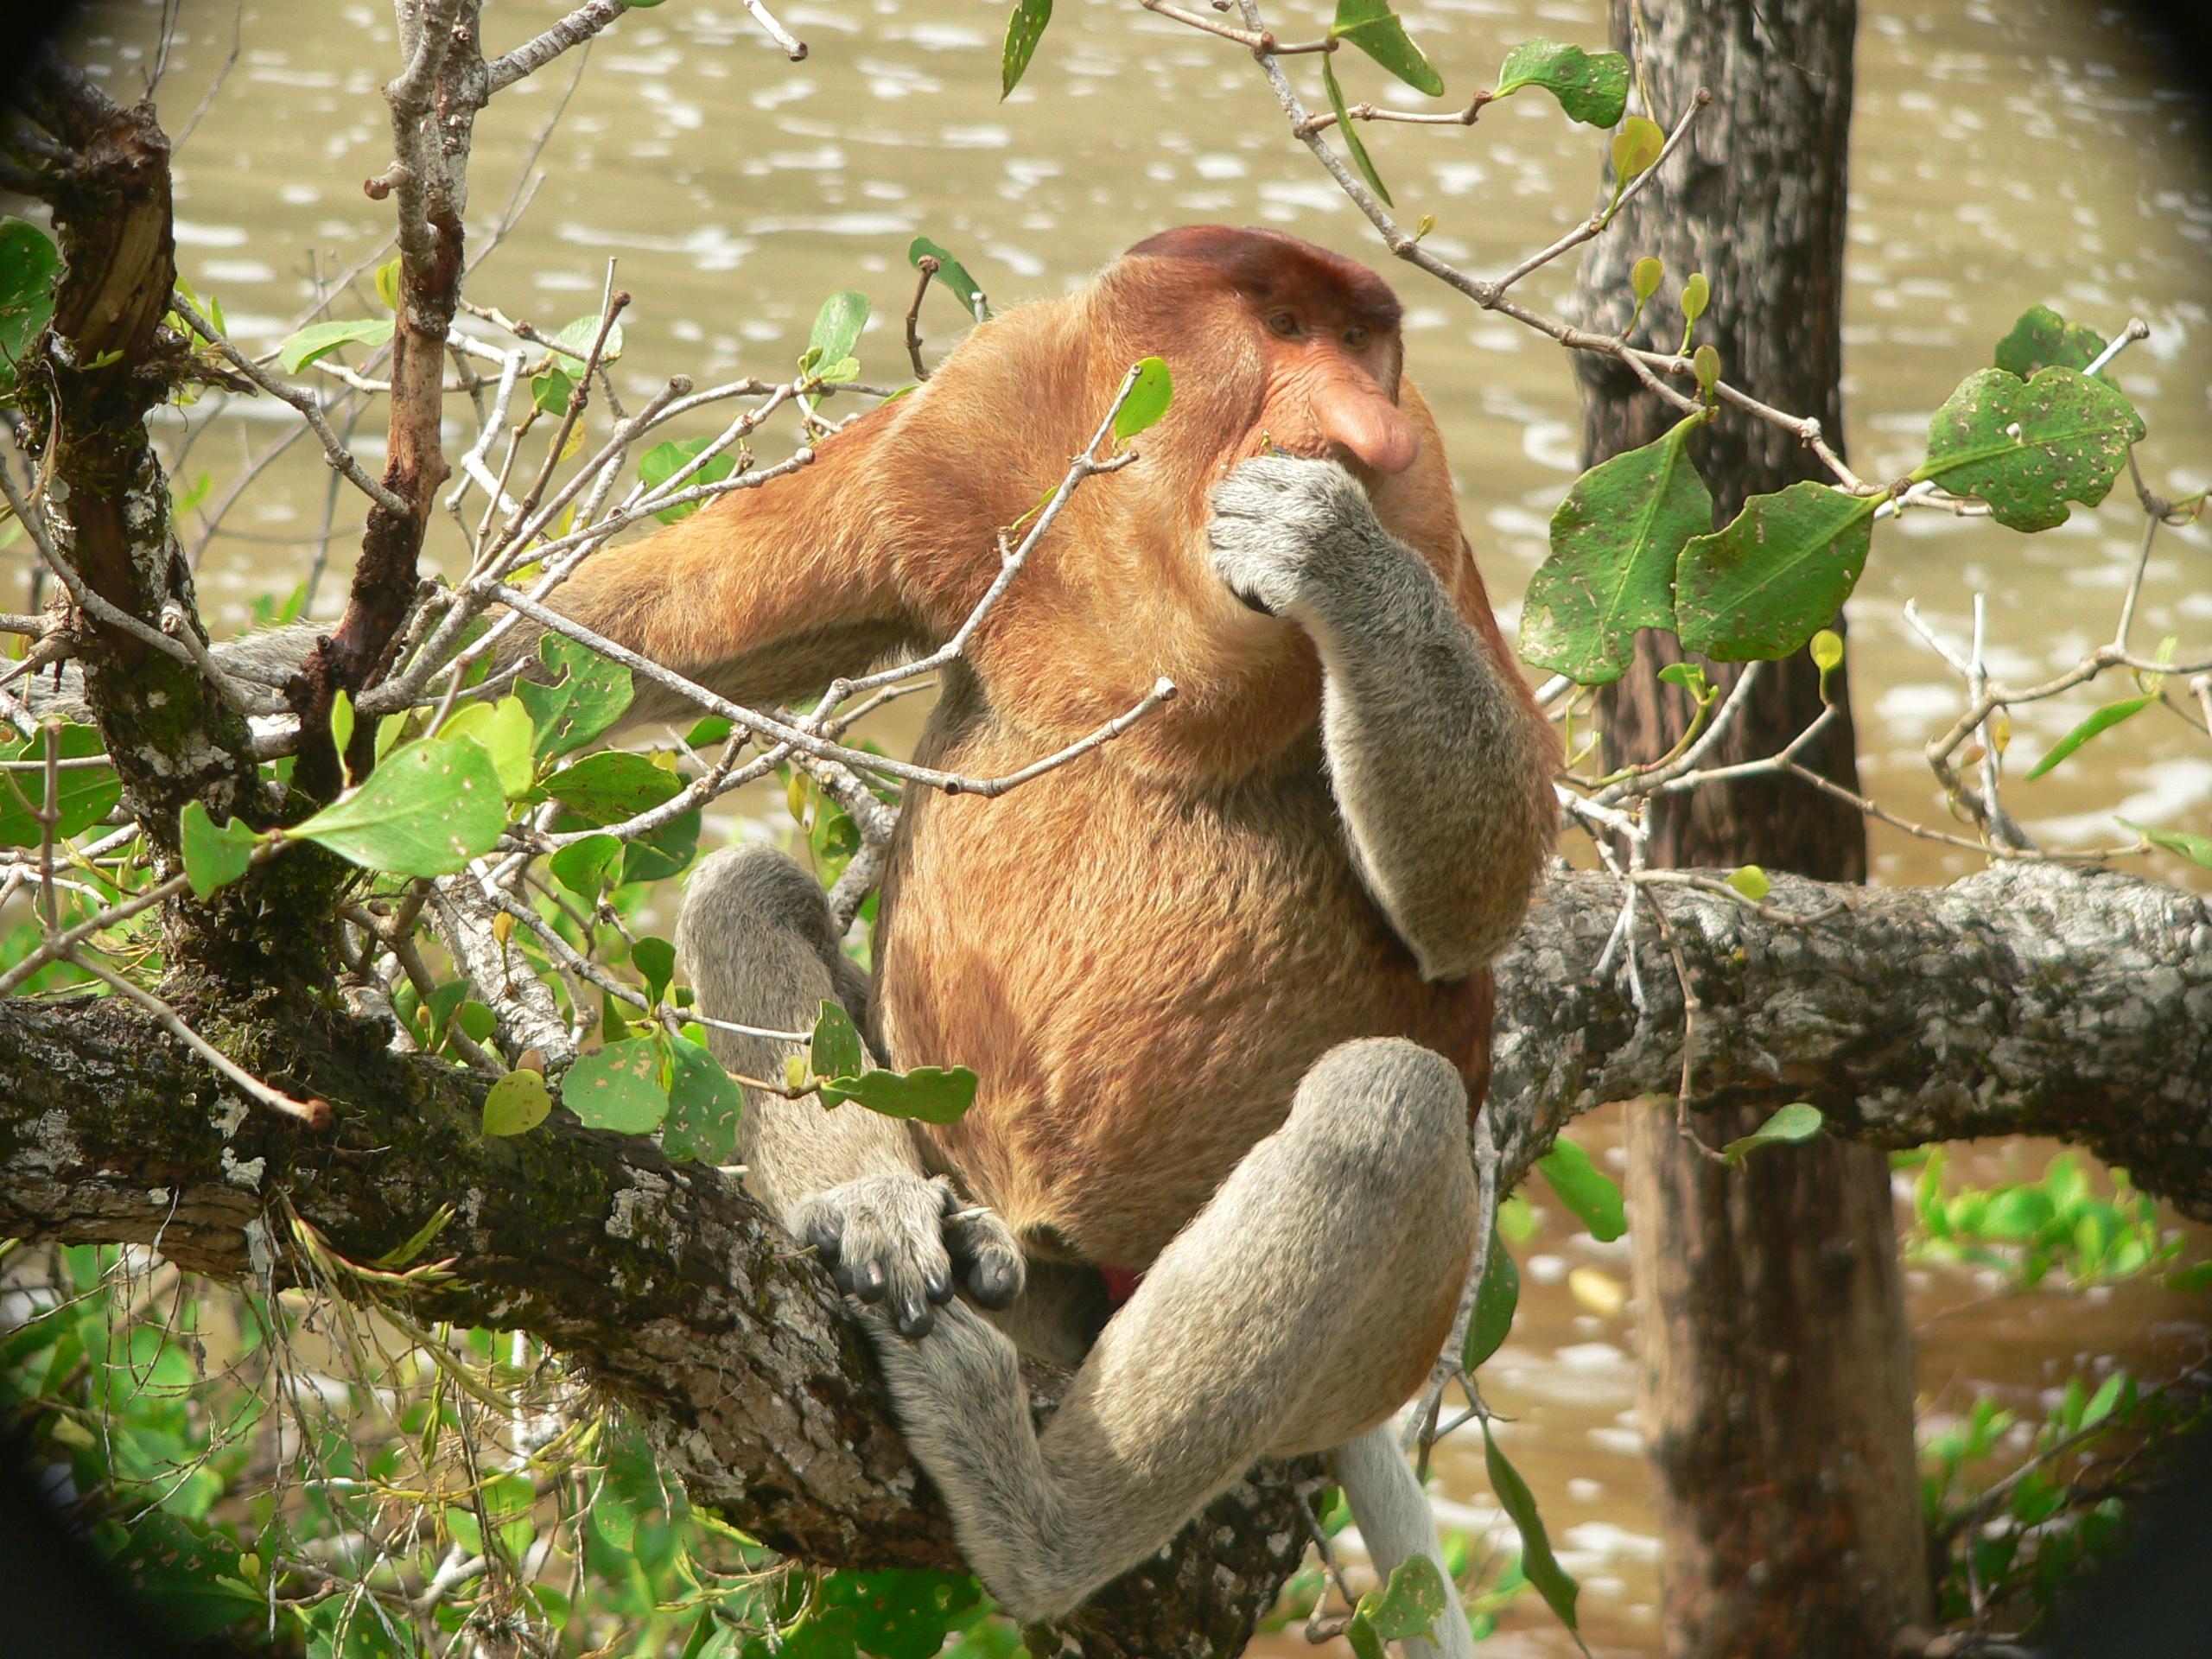 Kahau nosatý - samec krmící se na mangrovníku